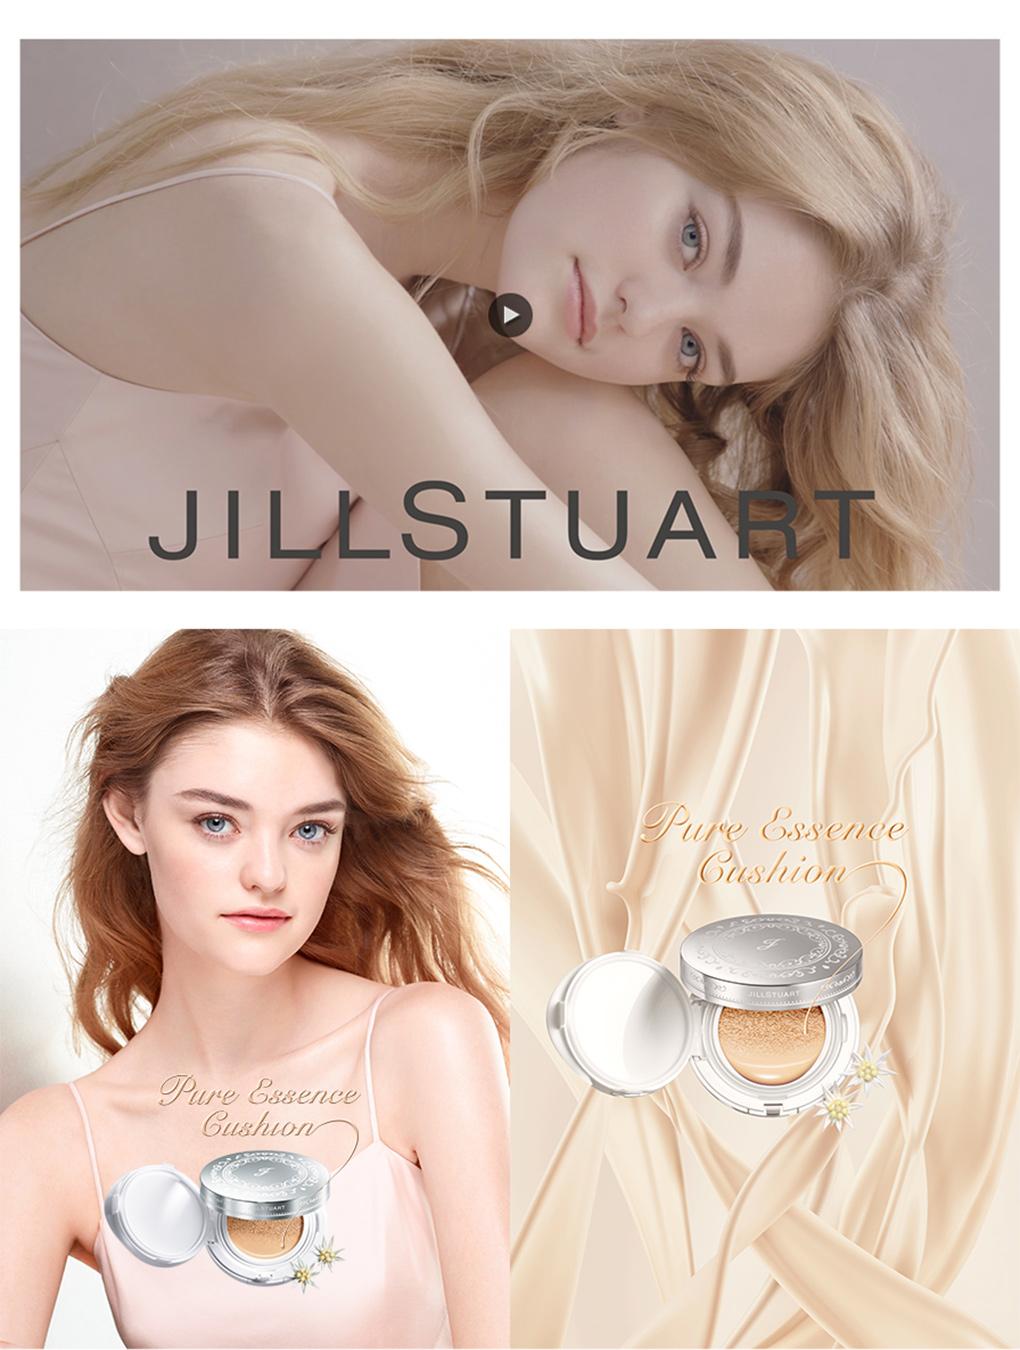 JILLSTUART Pure essence cushion